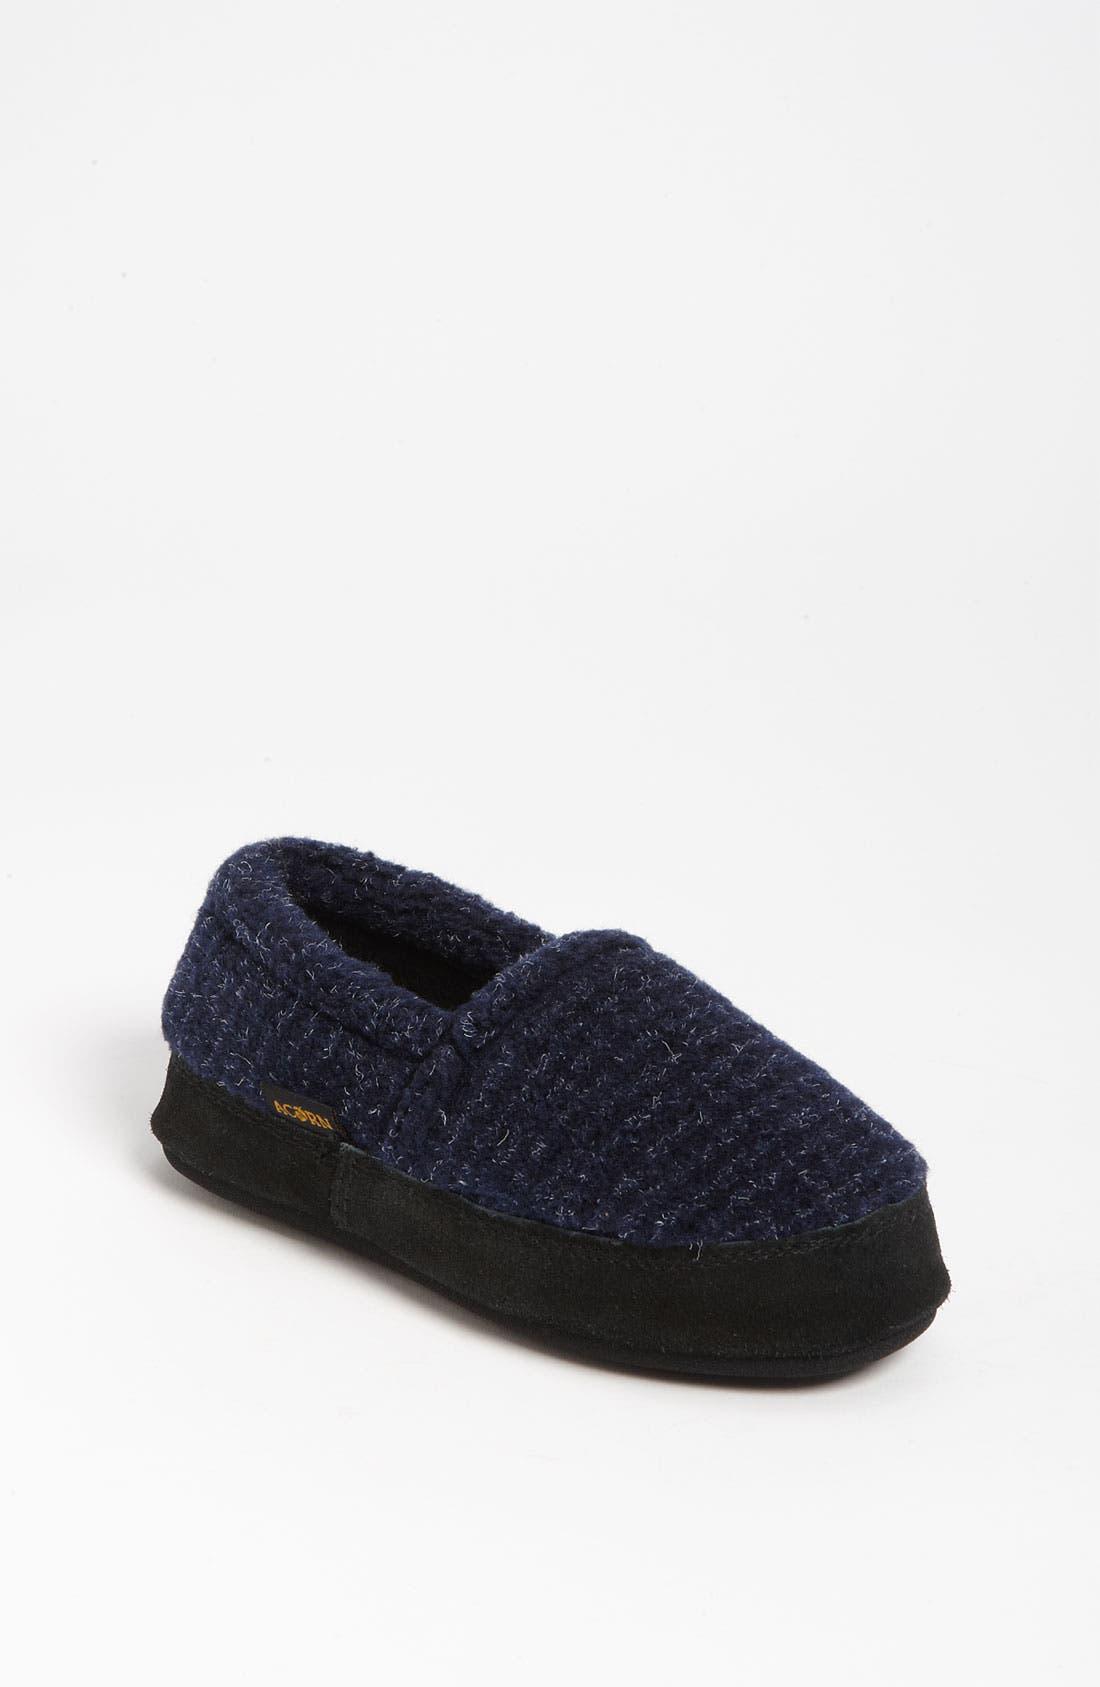 Alternate Image 1 Selected - Acorn 'Textured Moc' Slipper (Toddler, Little Kid & Big Kid)